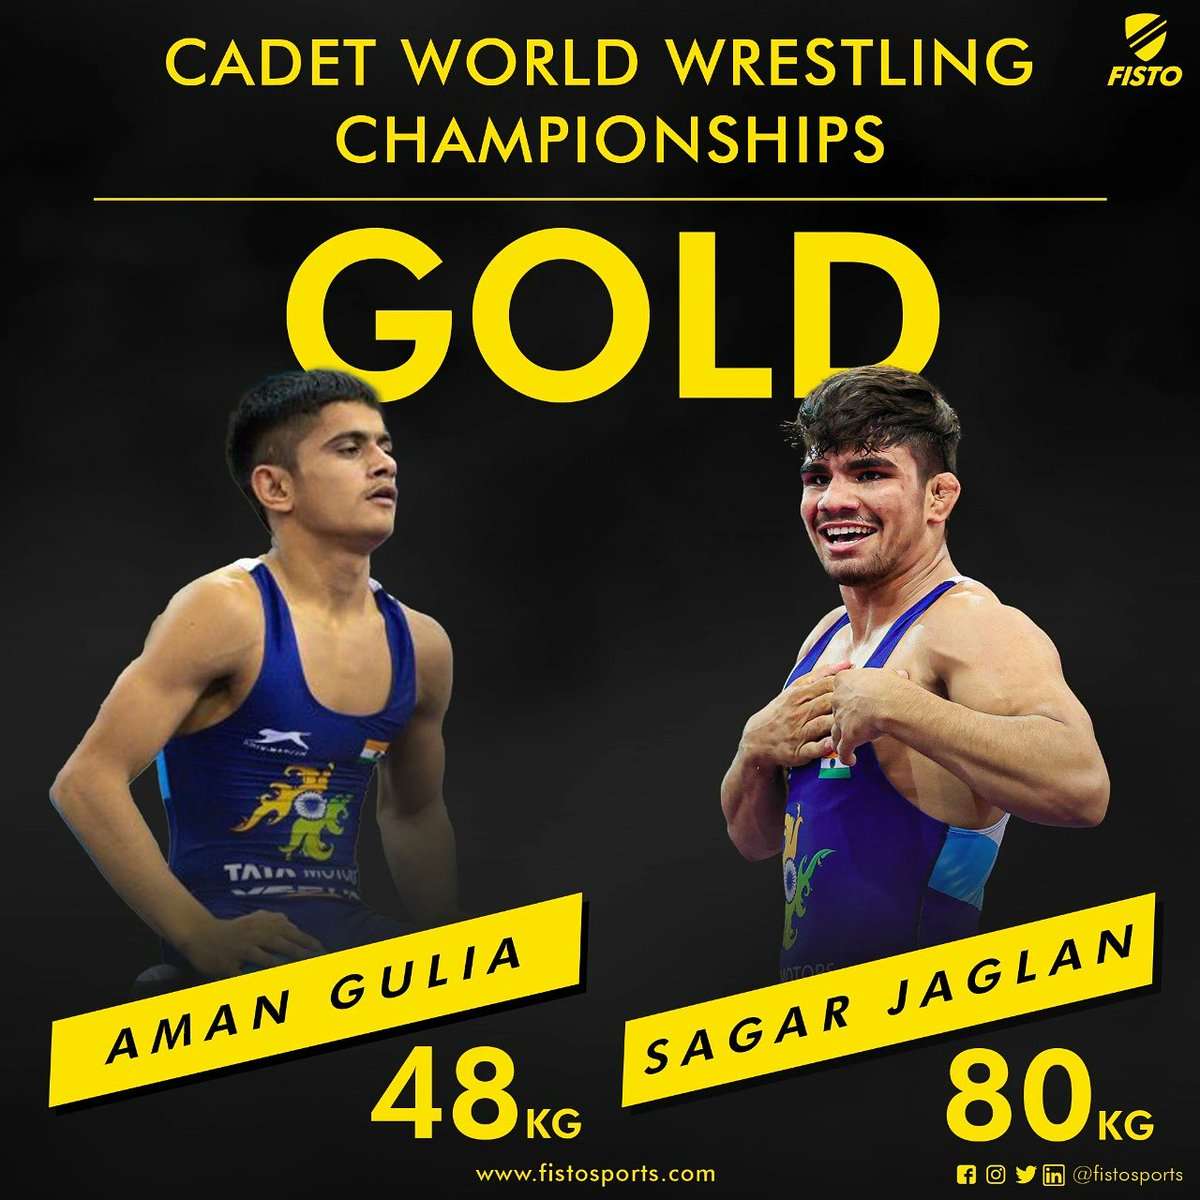 Aman Gulia and Sagar Jaglan become cadet world champions | అమన్ గులియా, సాగర్ జగ్లాన్ క్యాడెట్ ప్రపంచ ఛాంపియన్లుగా నిలిచారు |_40.1